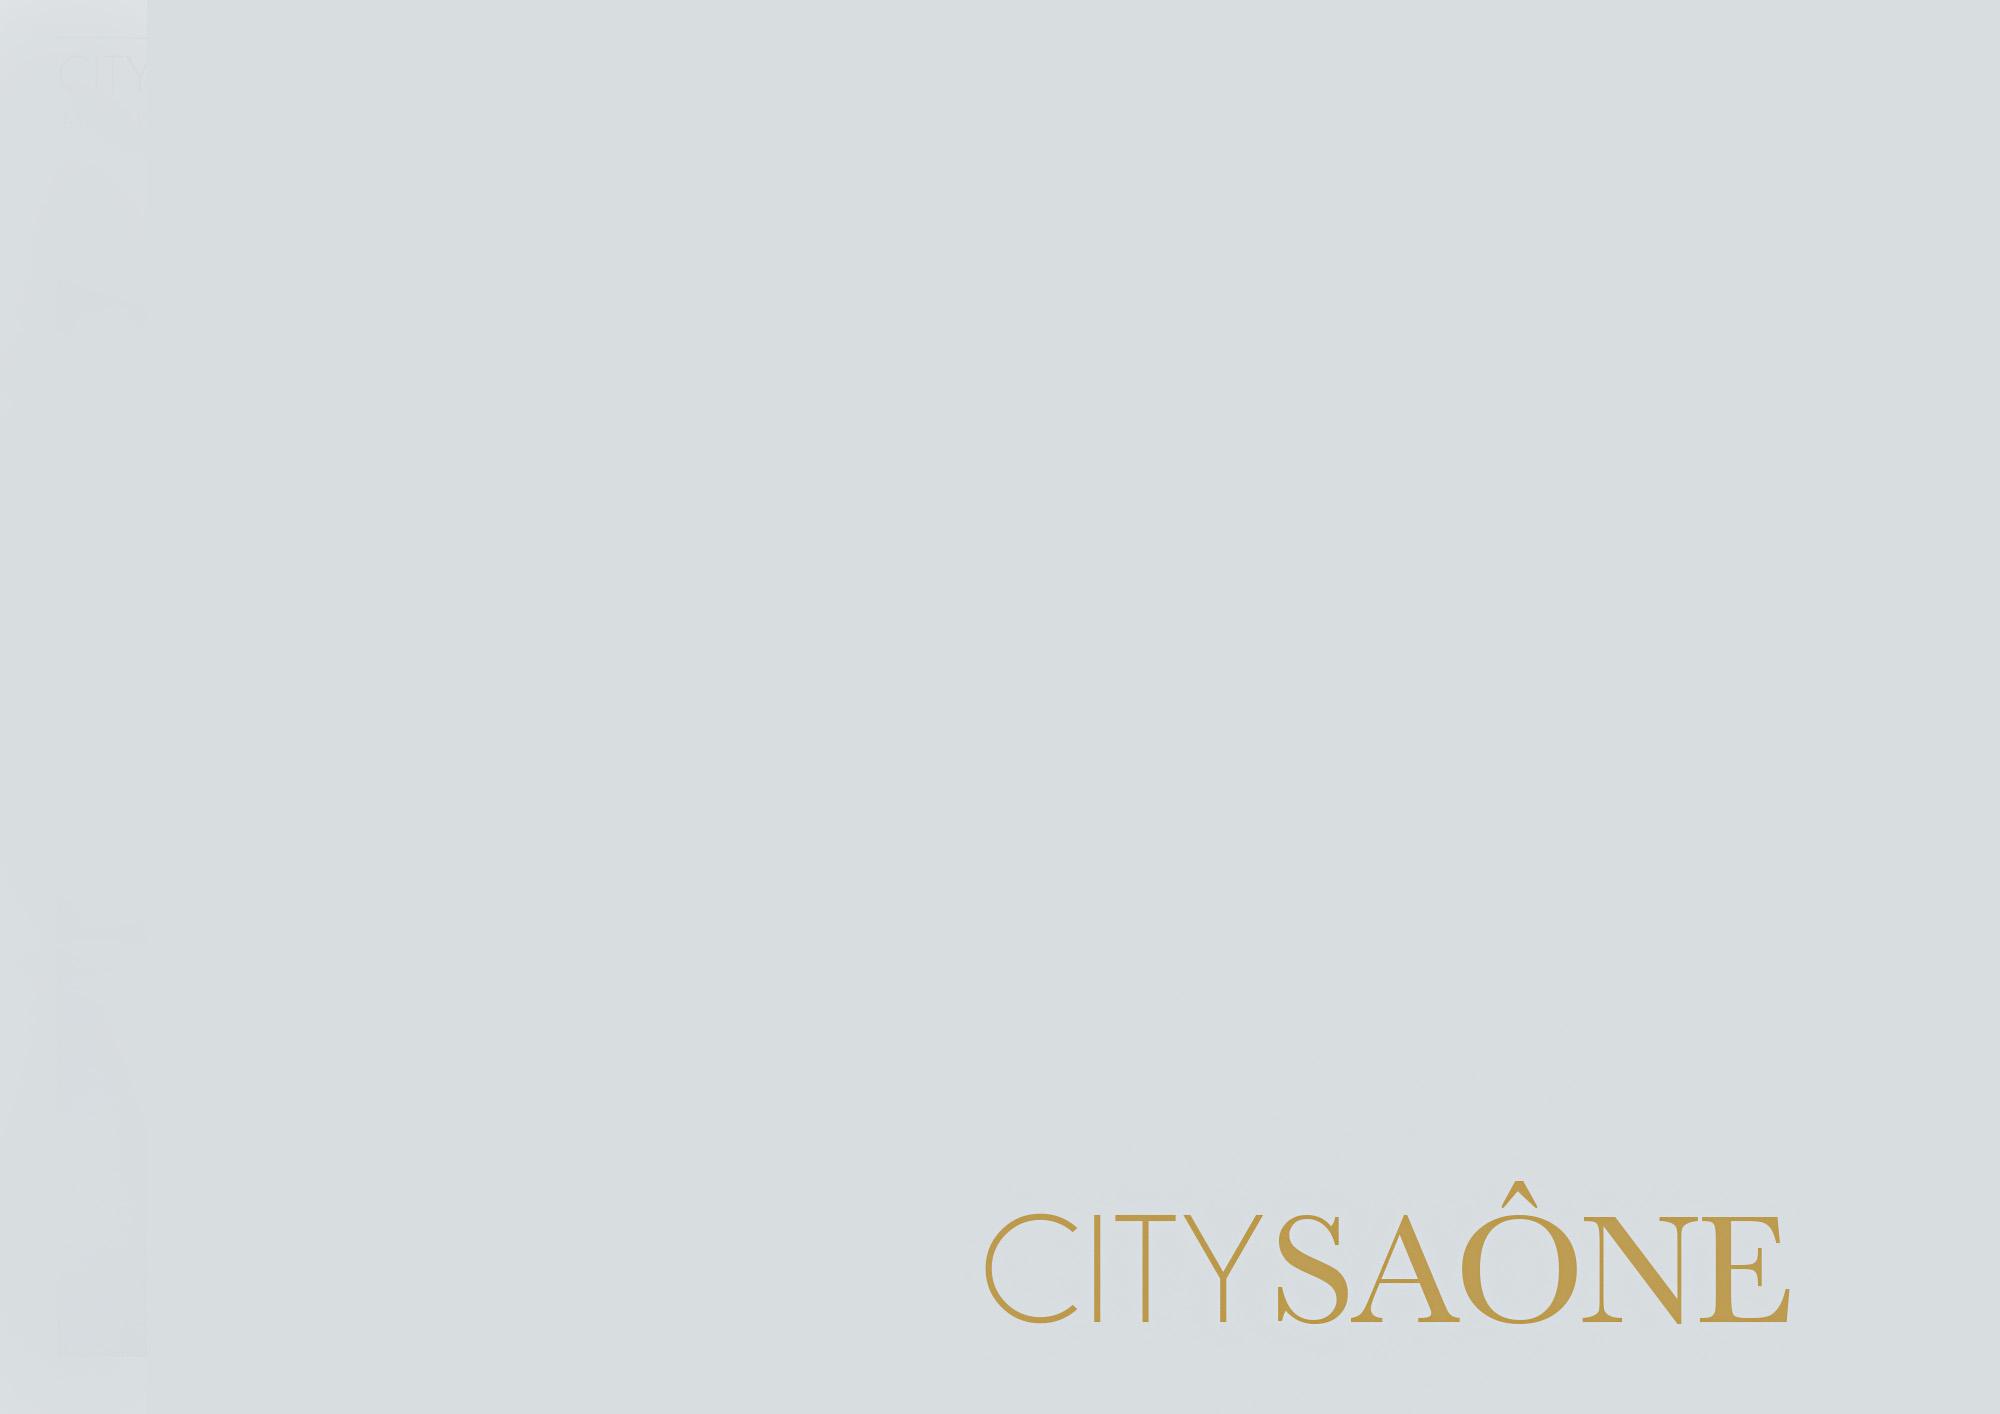 City-Saone